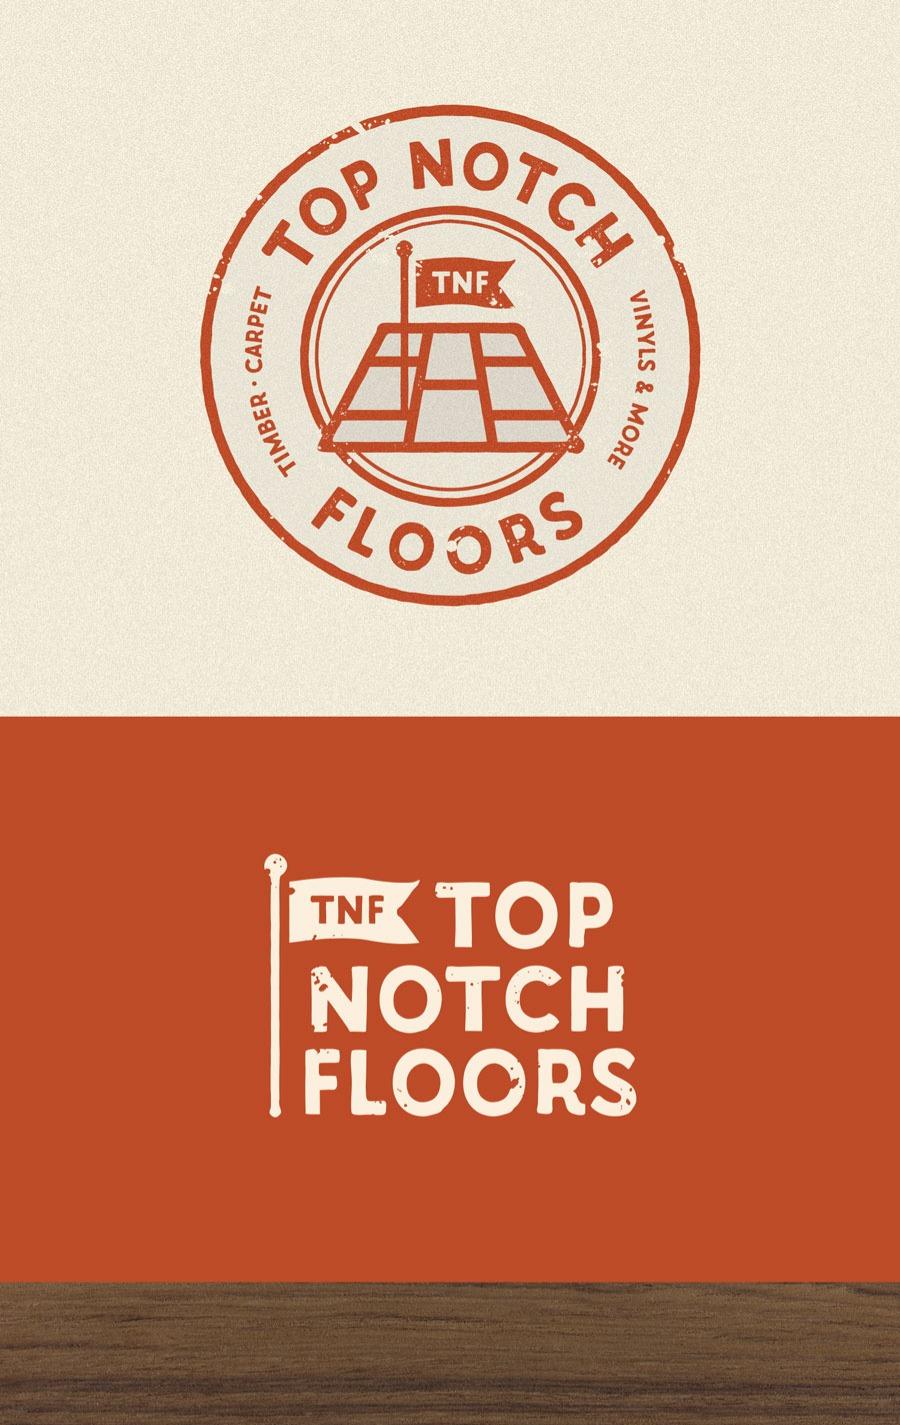 TopNotchFloors-web2_edited